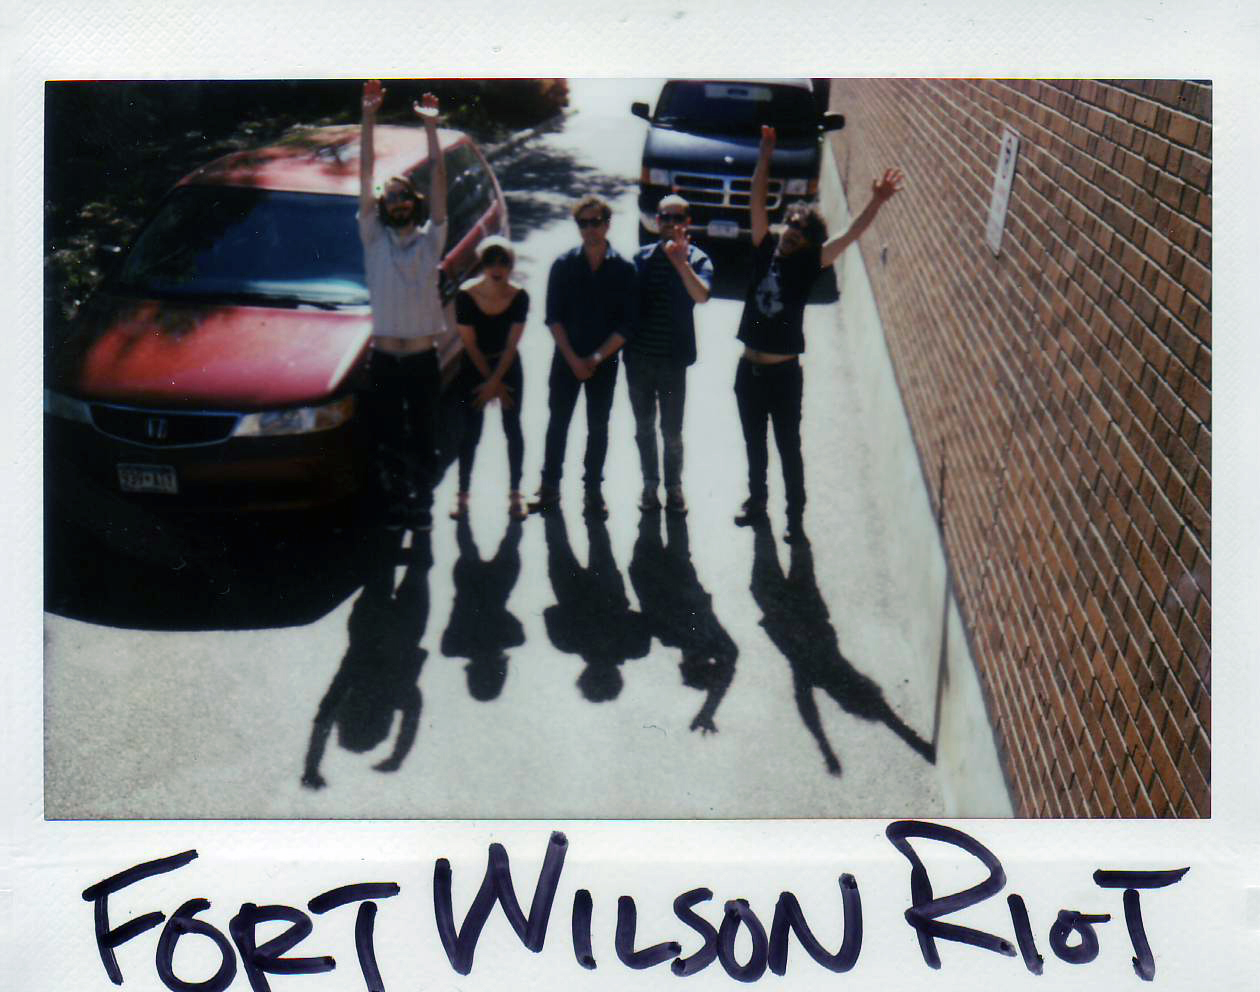 Fort Wilson Riot